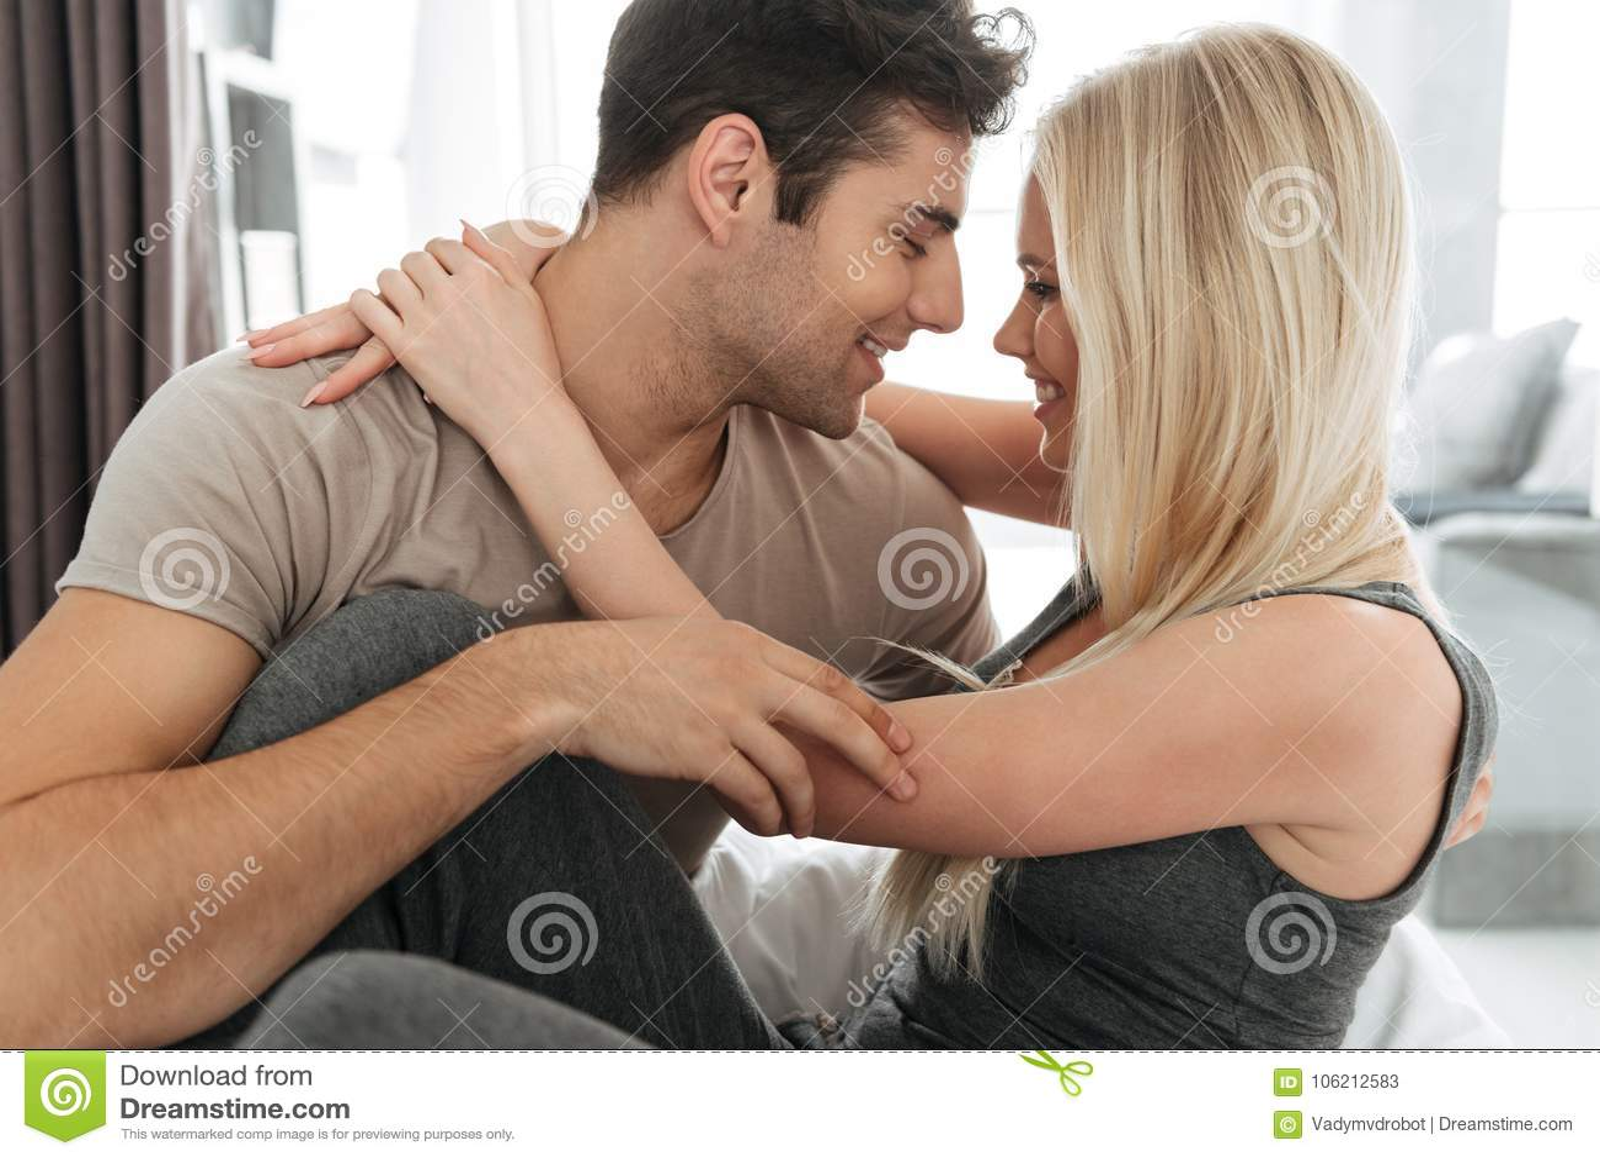 And flirting men Why Do